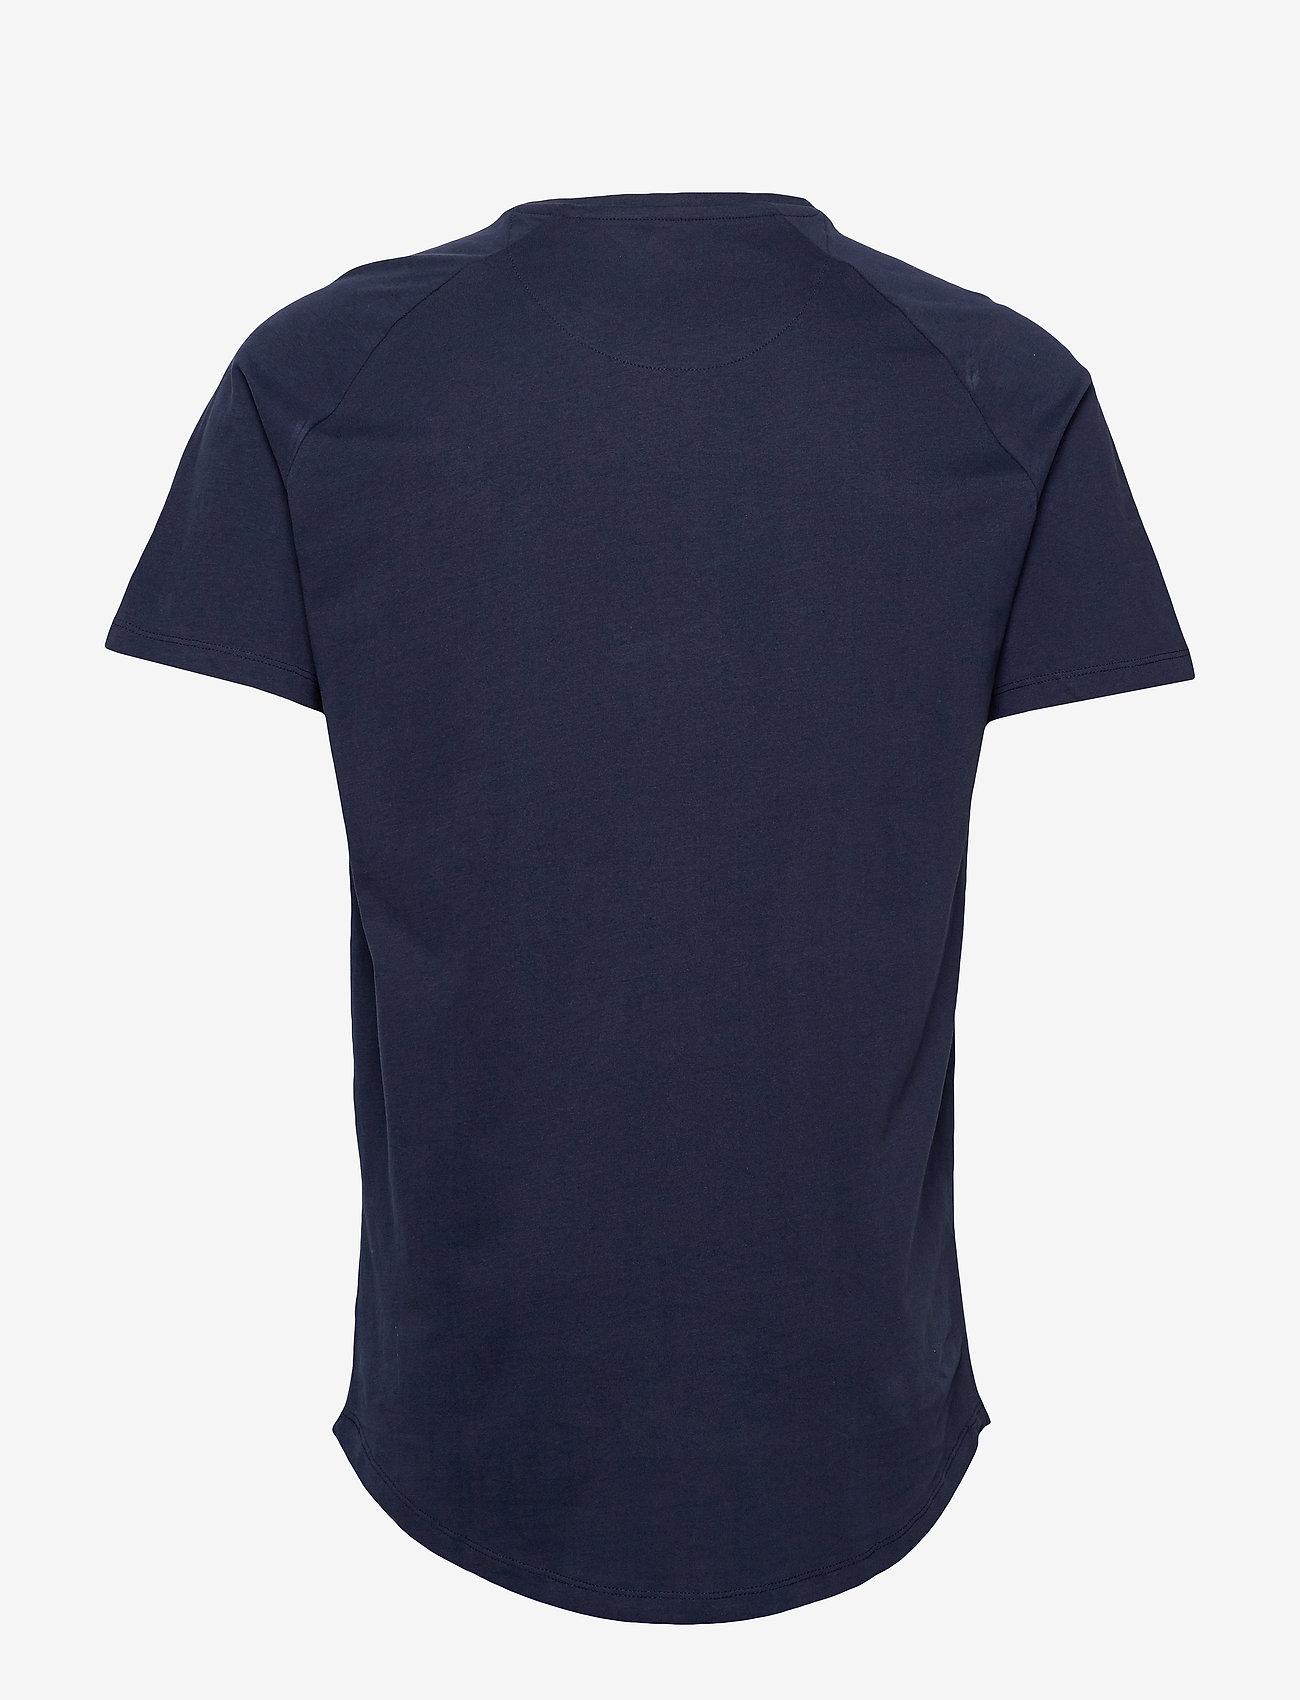 Jack & Jones - JJECURVED TEE SS O-NECK NOOS - basic t-shirts - navy blazer - 1